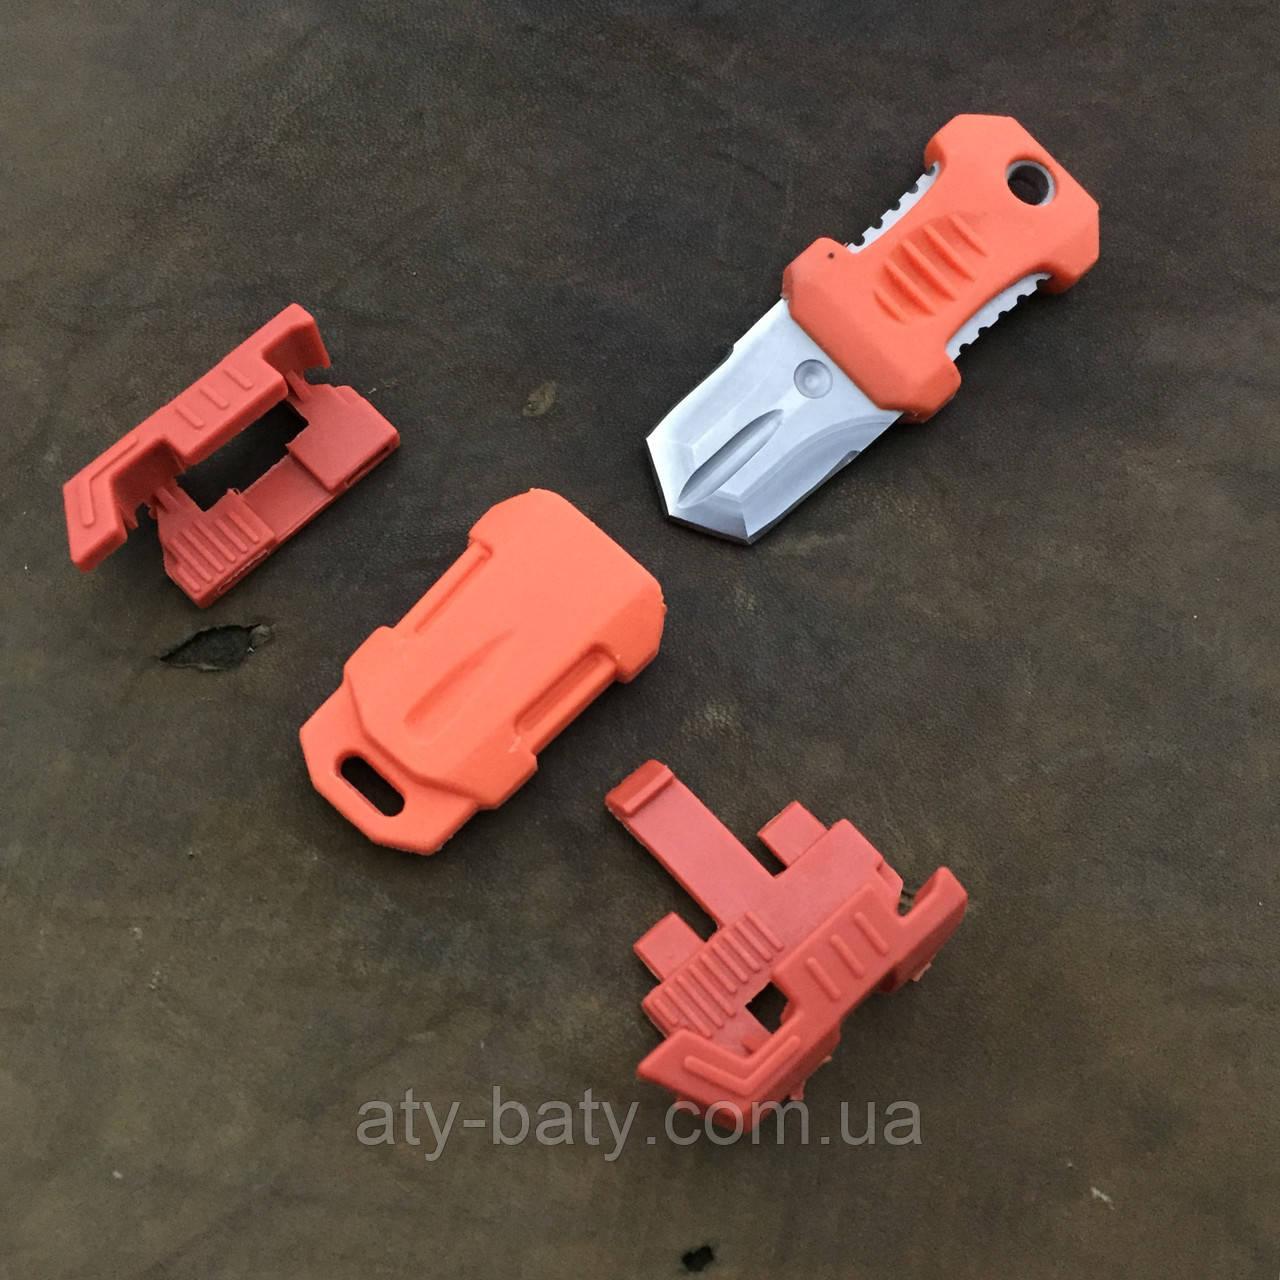 Нож S&S Precision Pocket Shiv (Реплика)